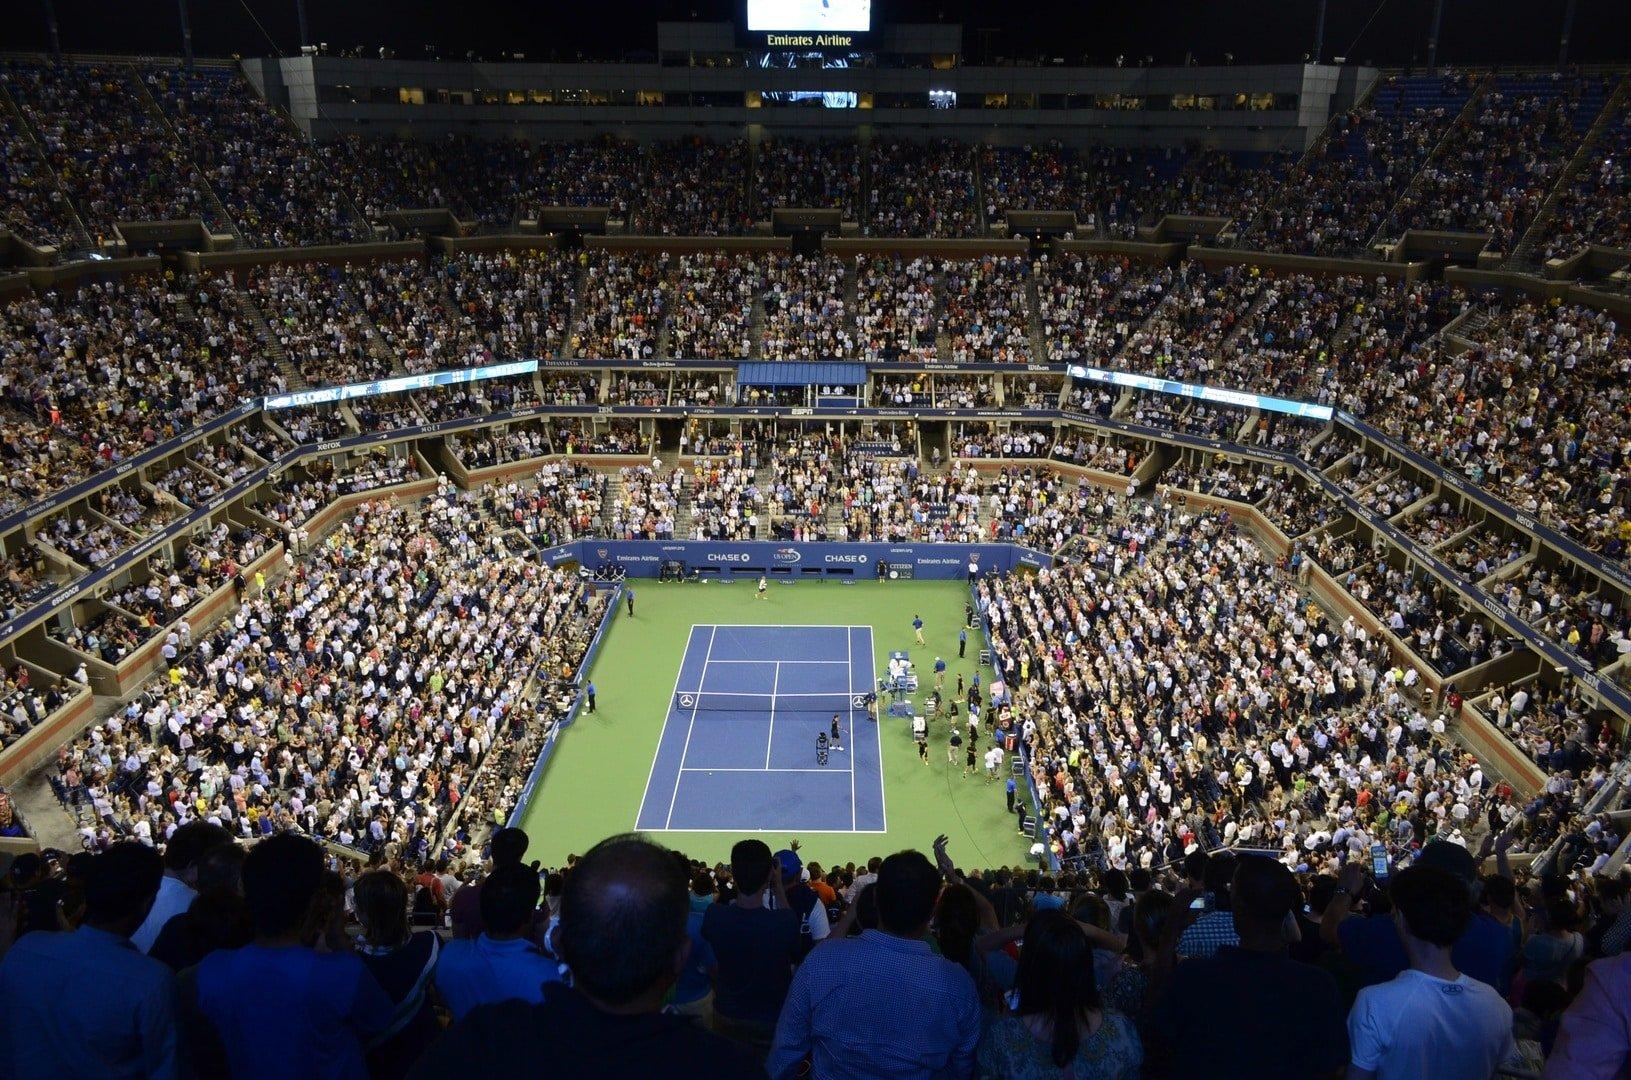 Alexander Zverev and Dominic Thiem Cruise Past Rivals, Reach US Open Finals